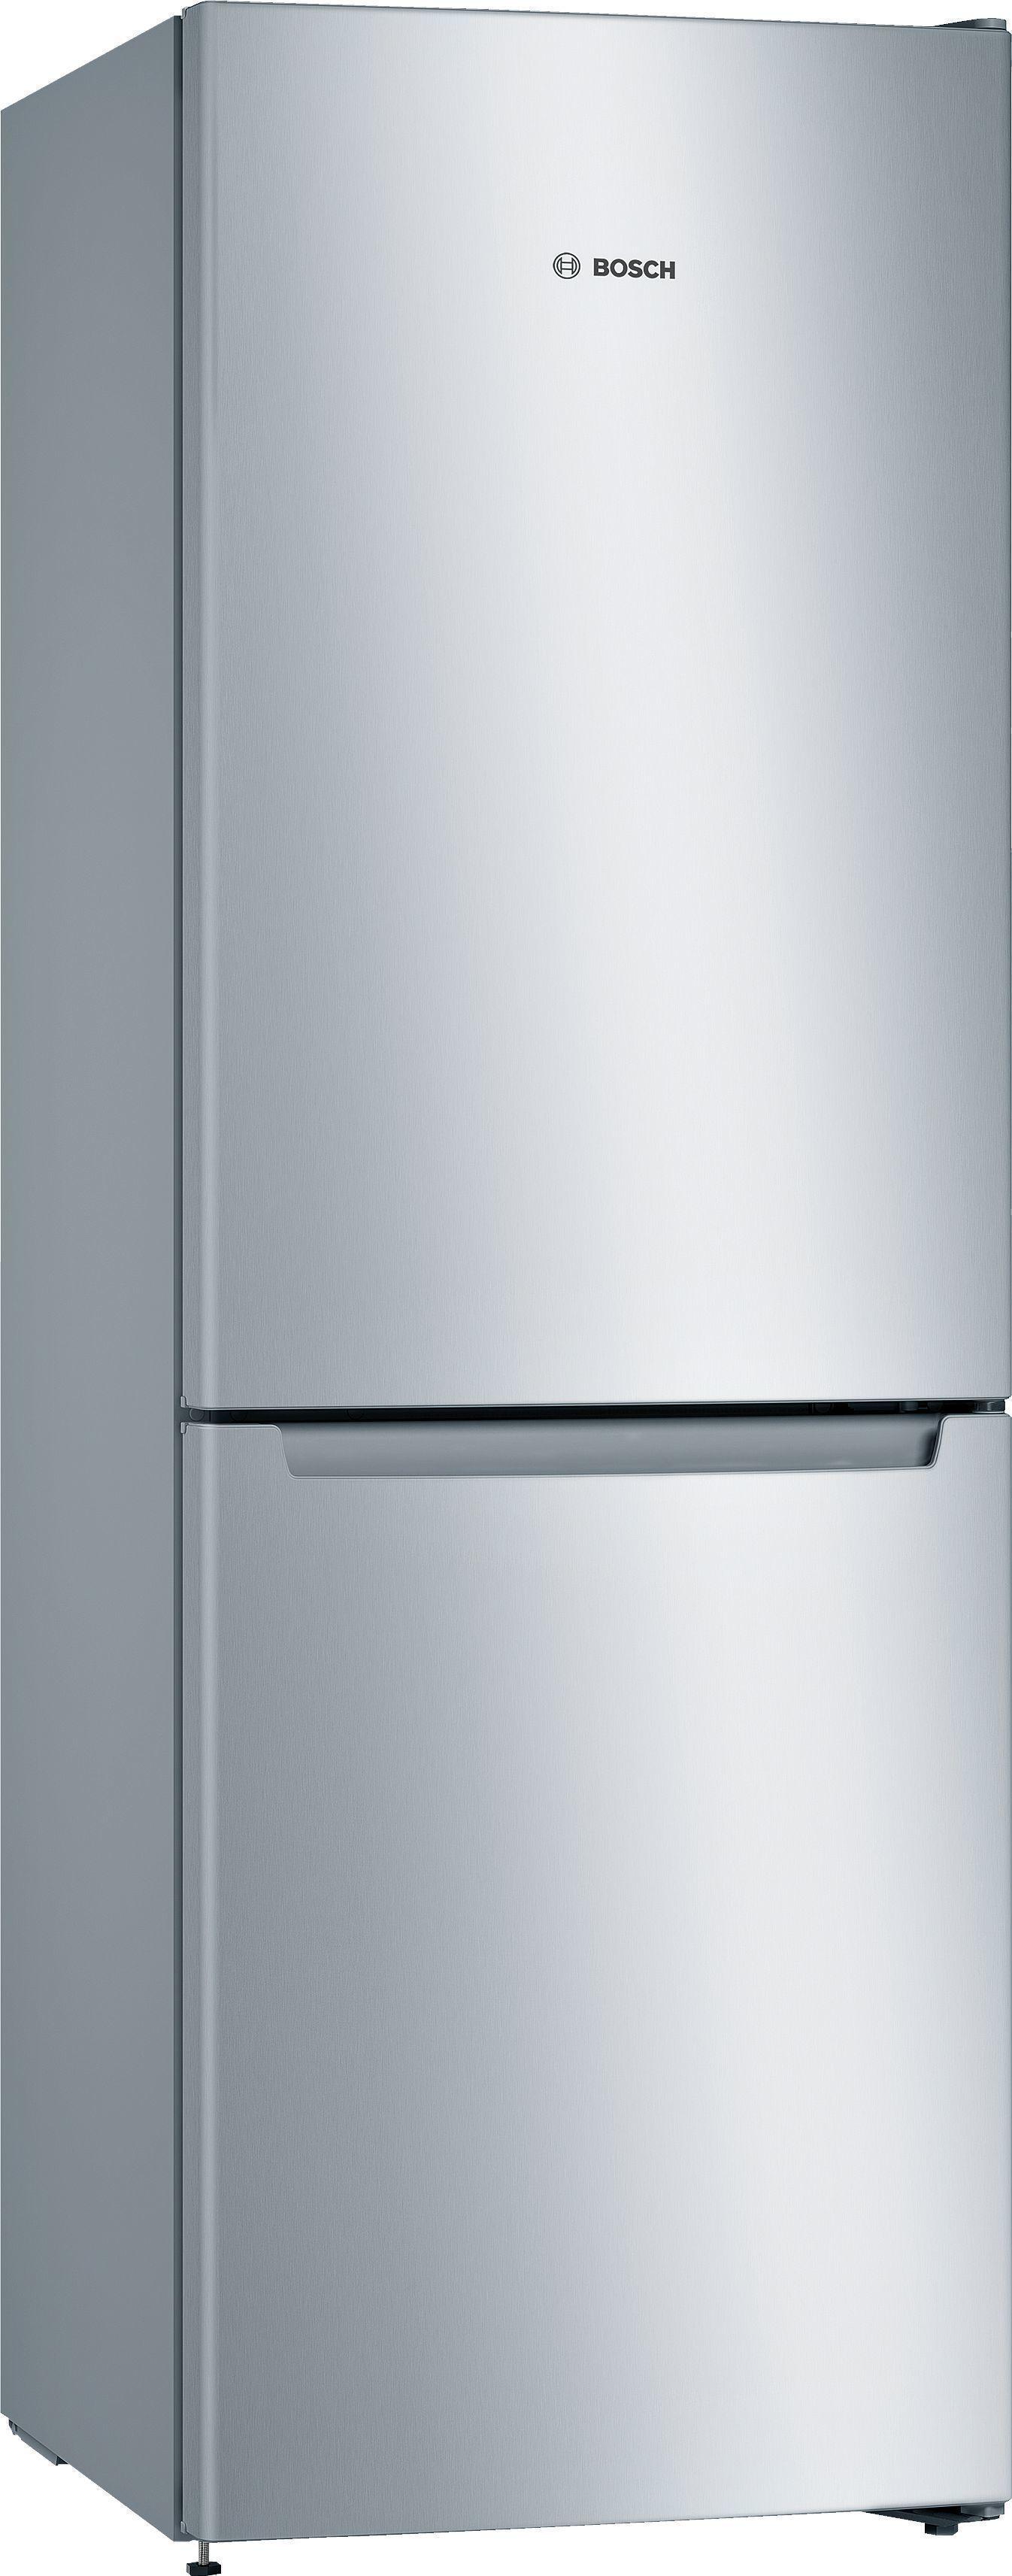 Frigorifico Bosch KGN33NLEA Combi 176 Inox Nf A++